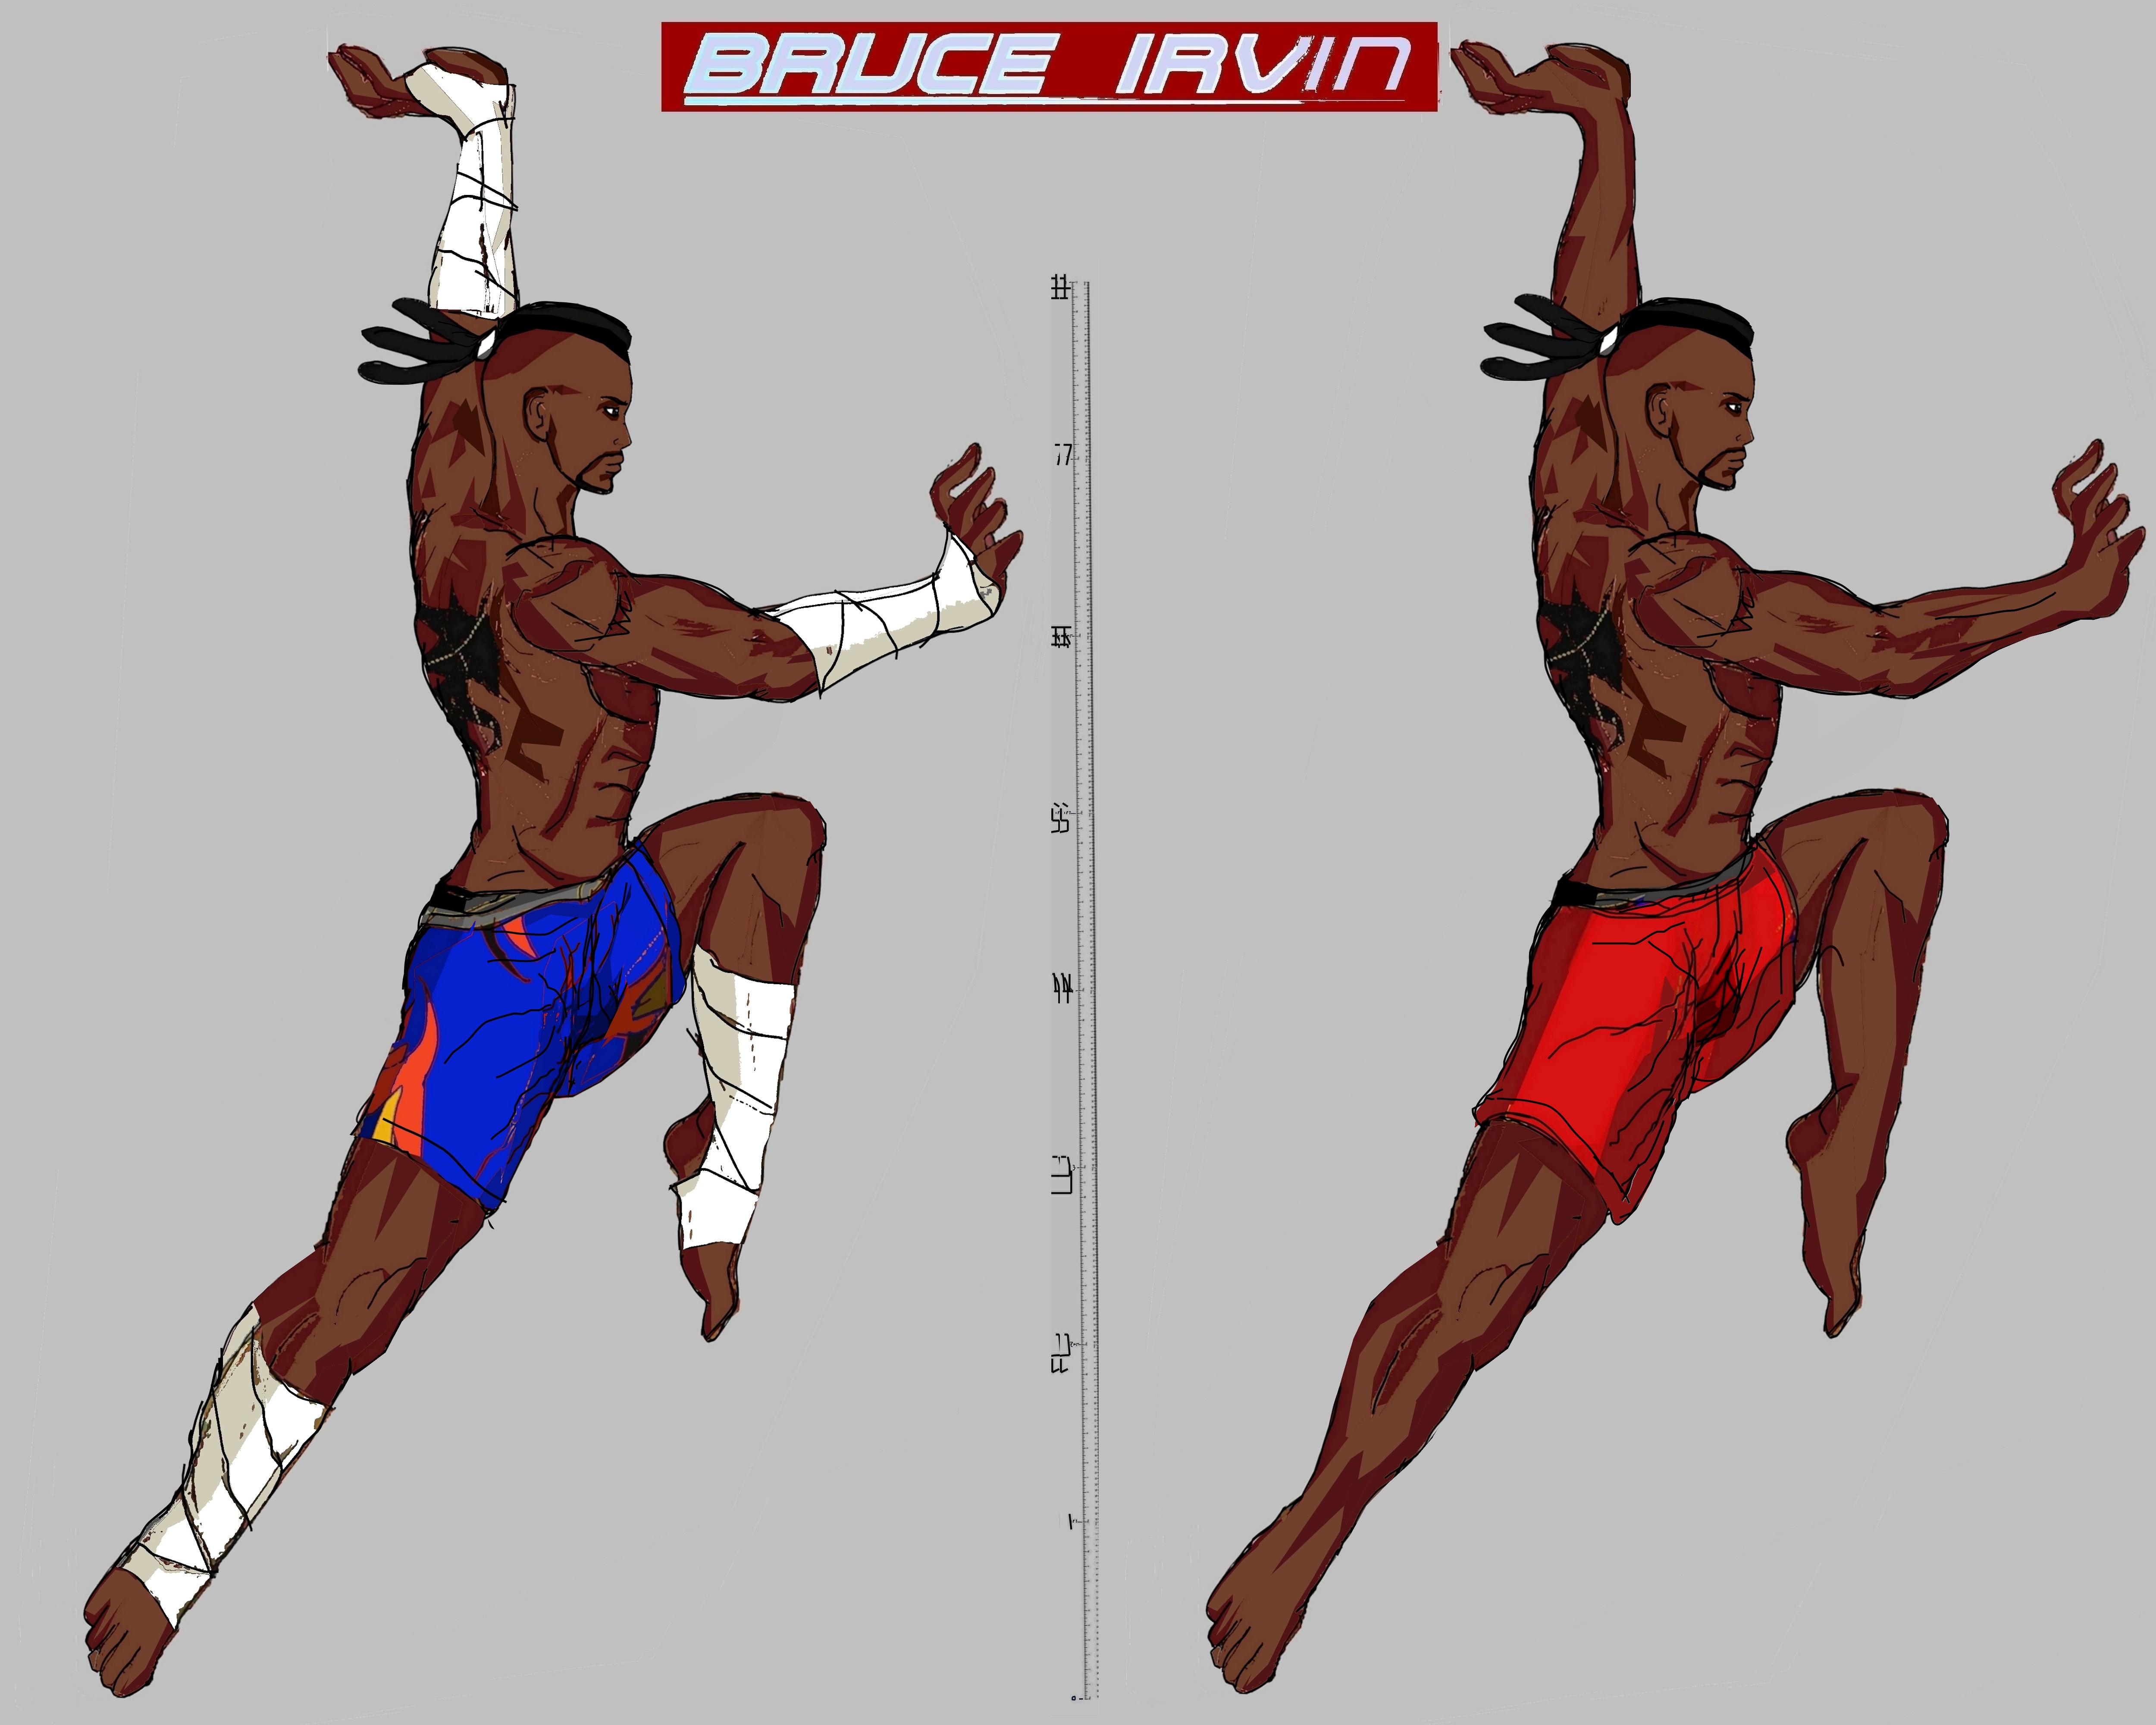 Tekken 7 Bruce Irvin By La Laker On Deviantart